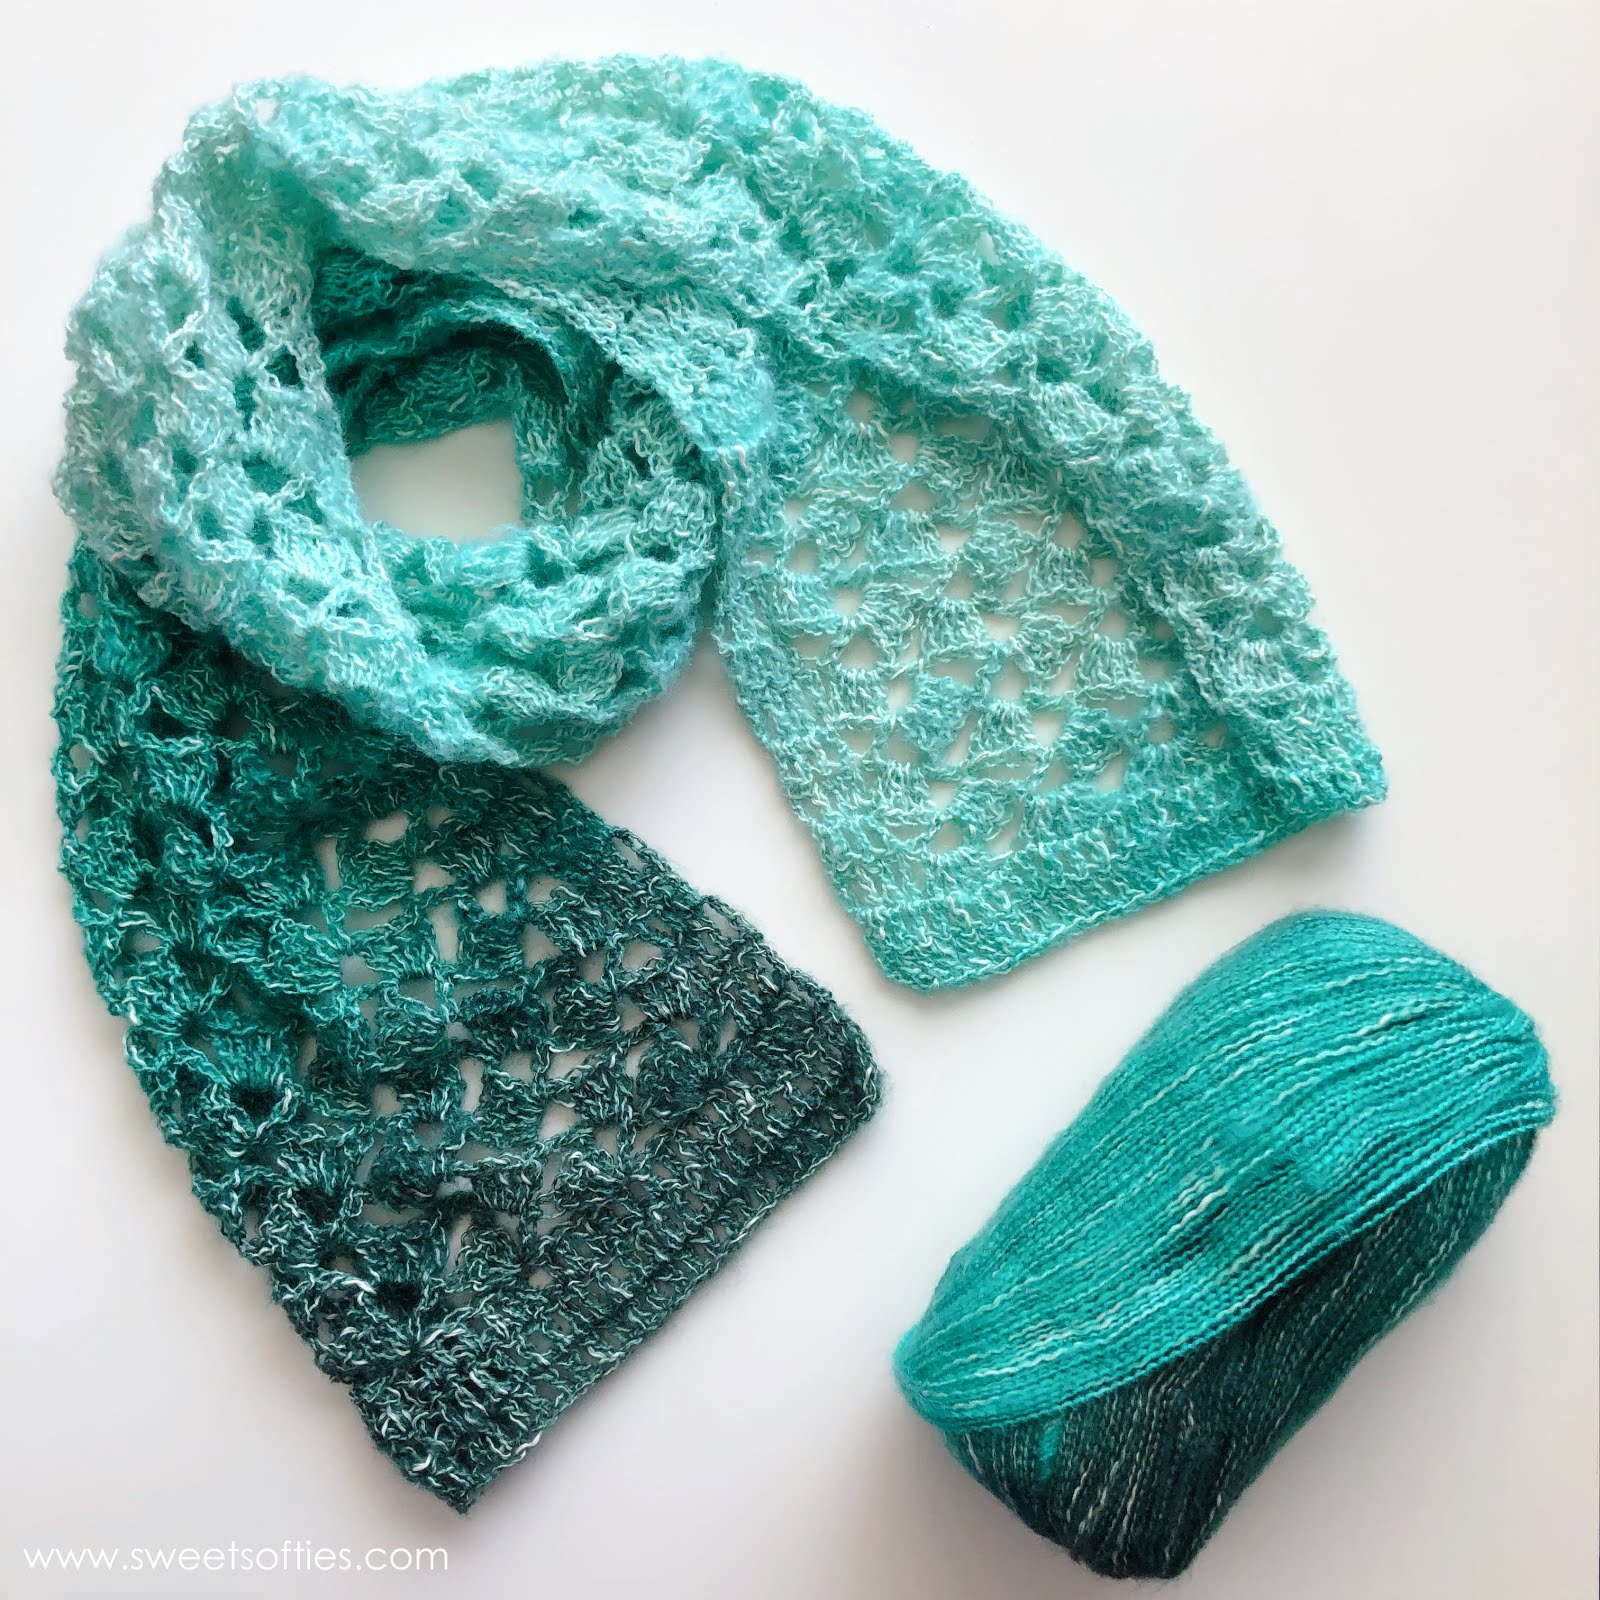 Jade pool scarf free crochet pattern sweet softies for Thread pool design pattern